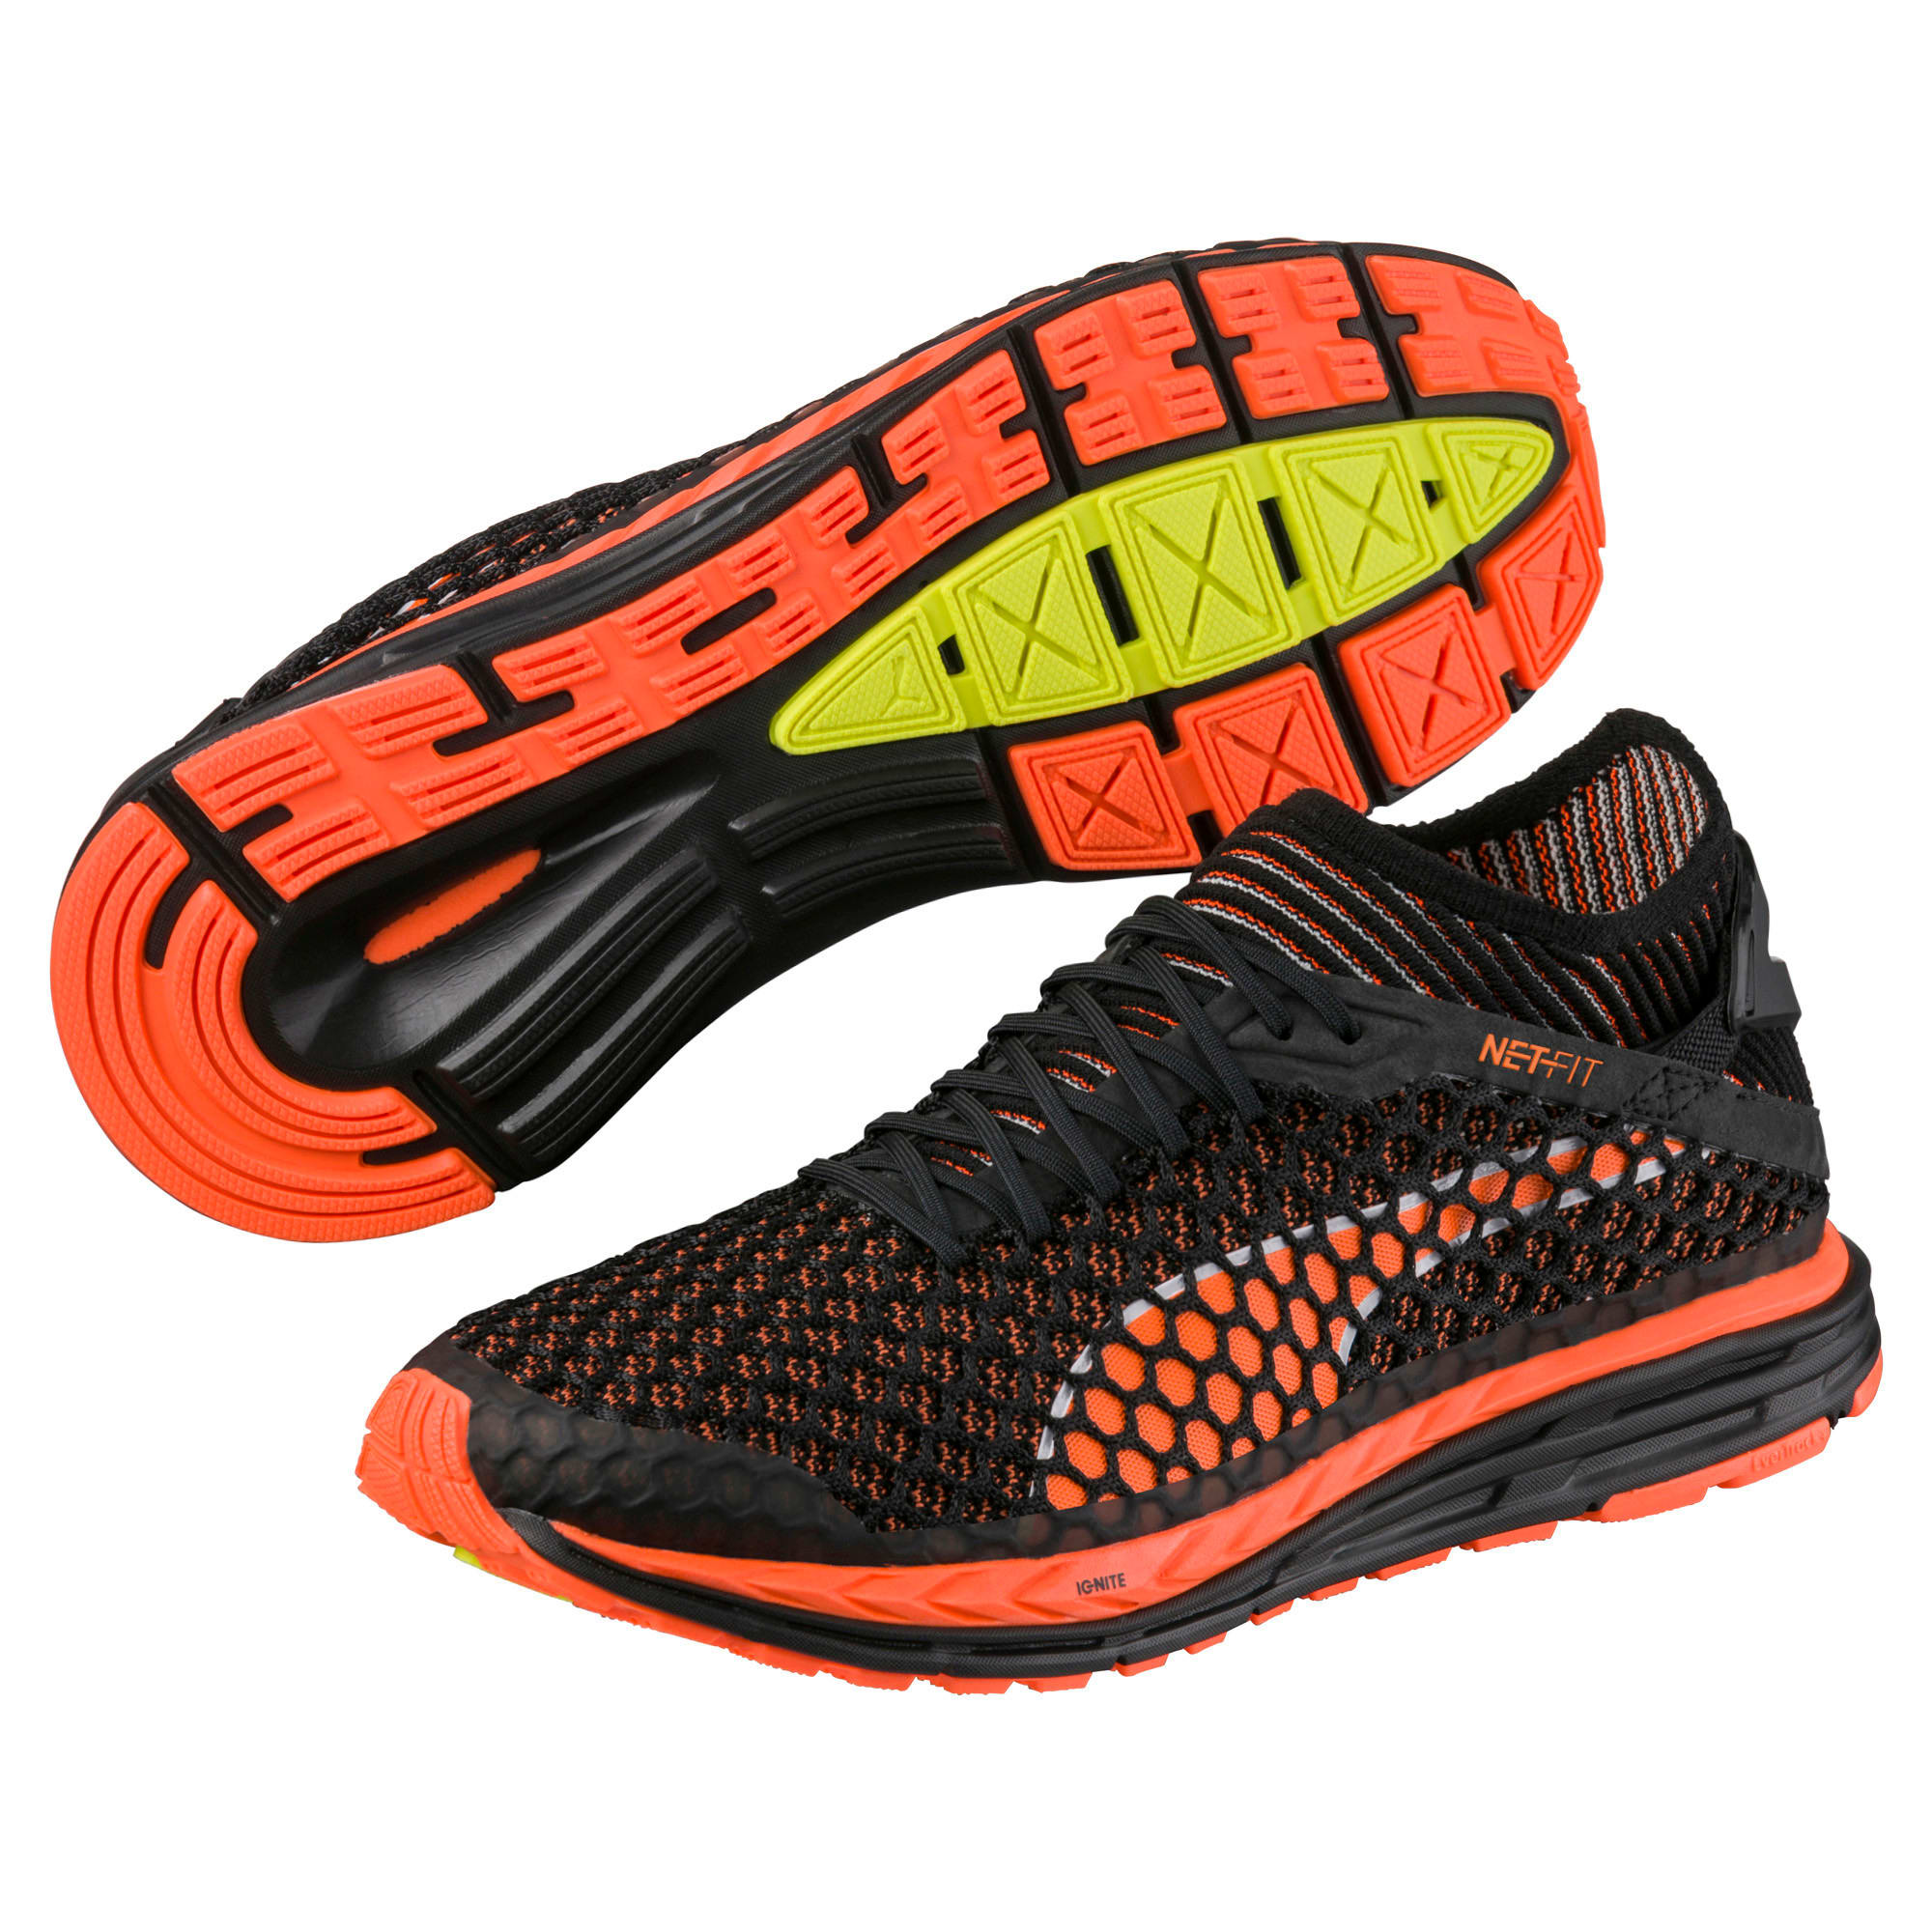 Thumbnail 2 of Speed IGNITE NETFIT Men's Running Shoes, Black-Shocking Orange-White, medium-IND